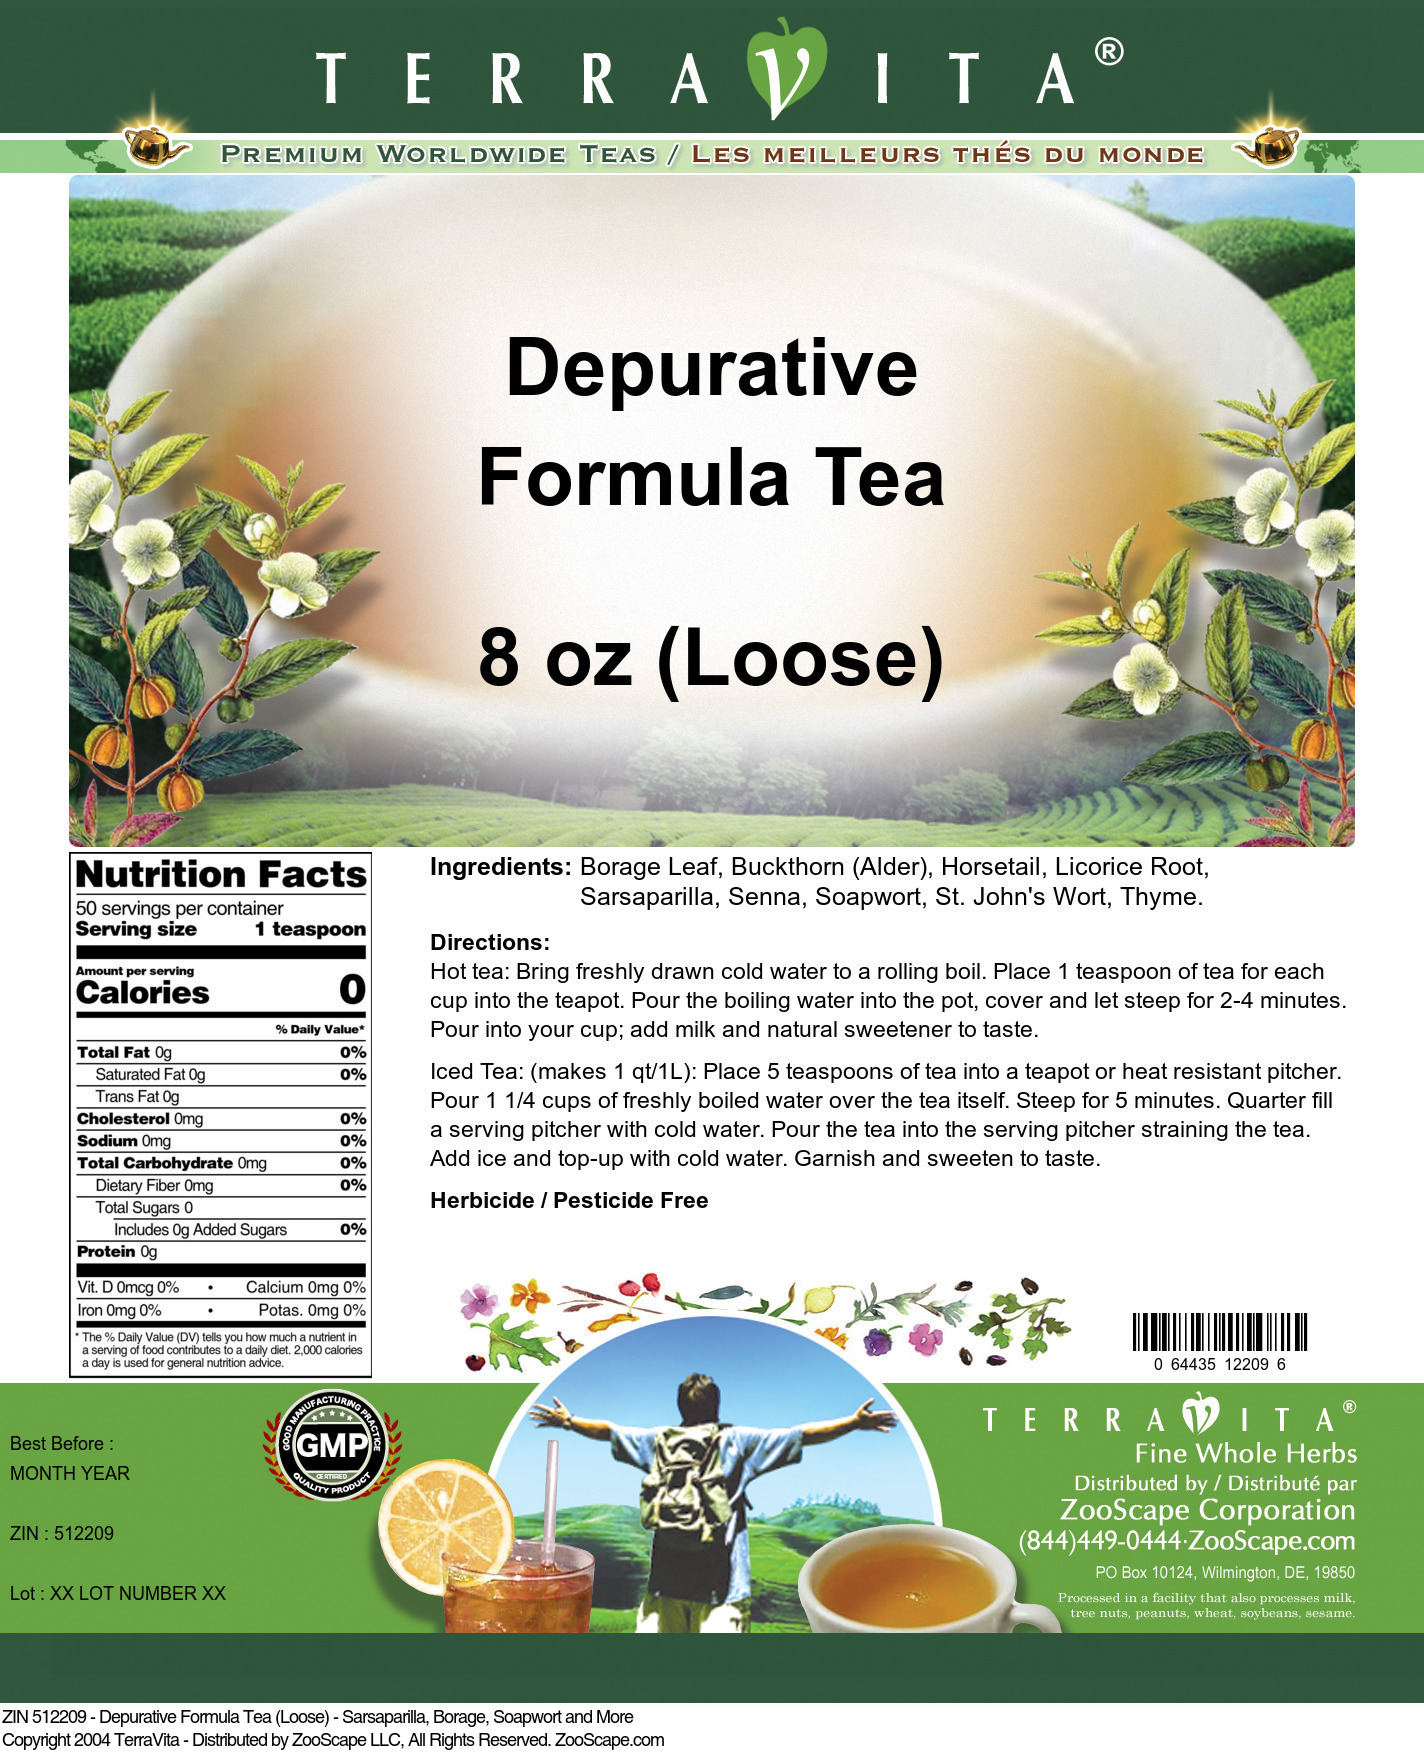 Depurative Formula Tea (Loose) - Sarsaparilla, Borage, Soapwort and More